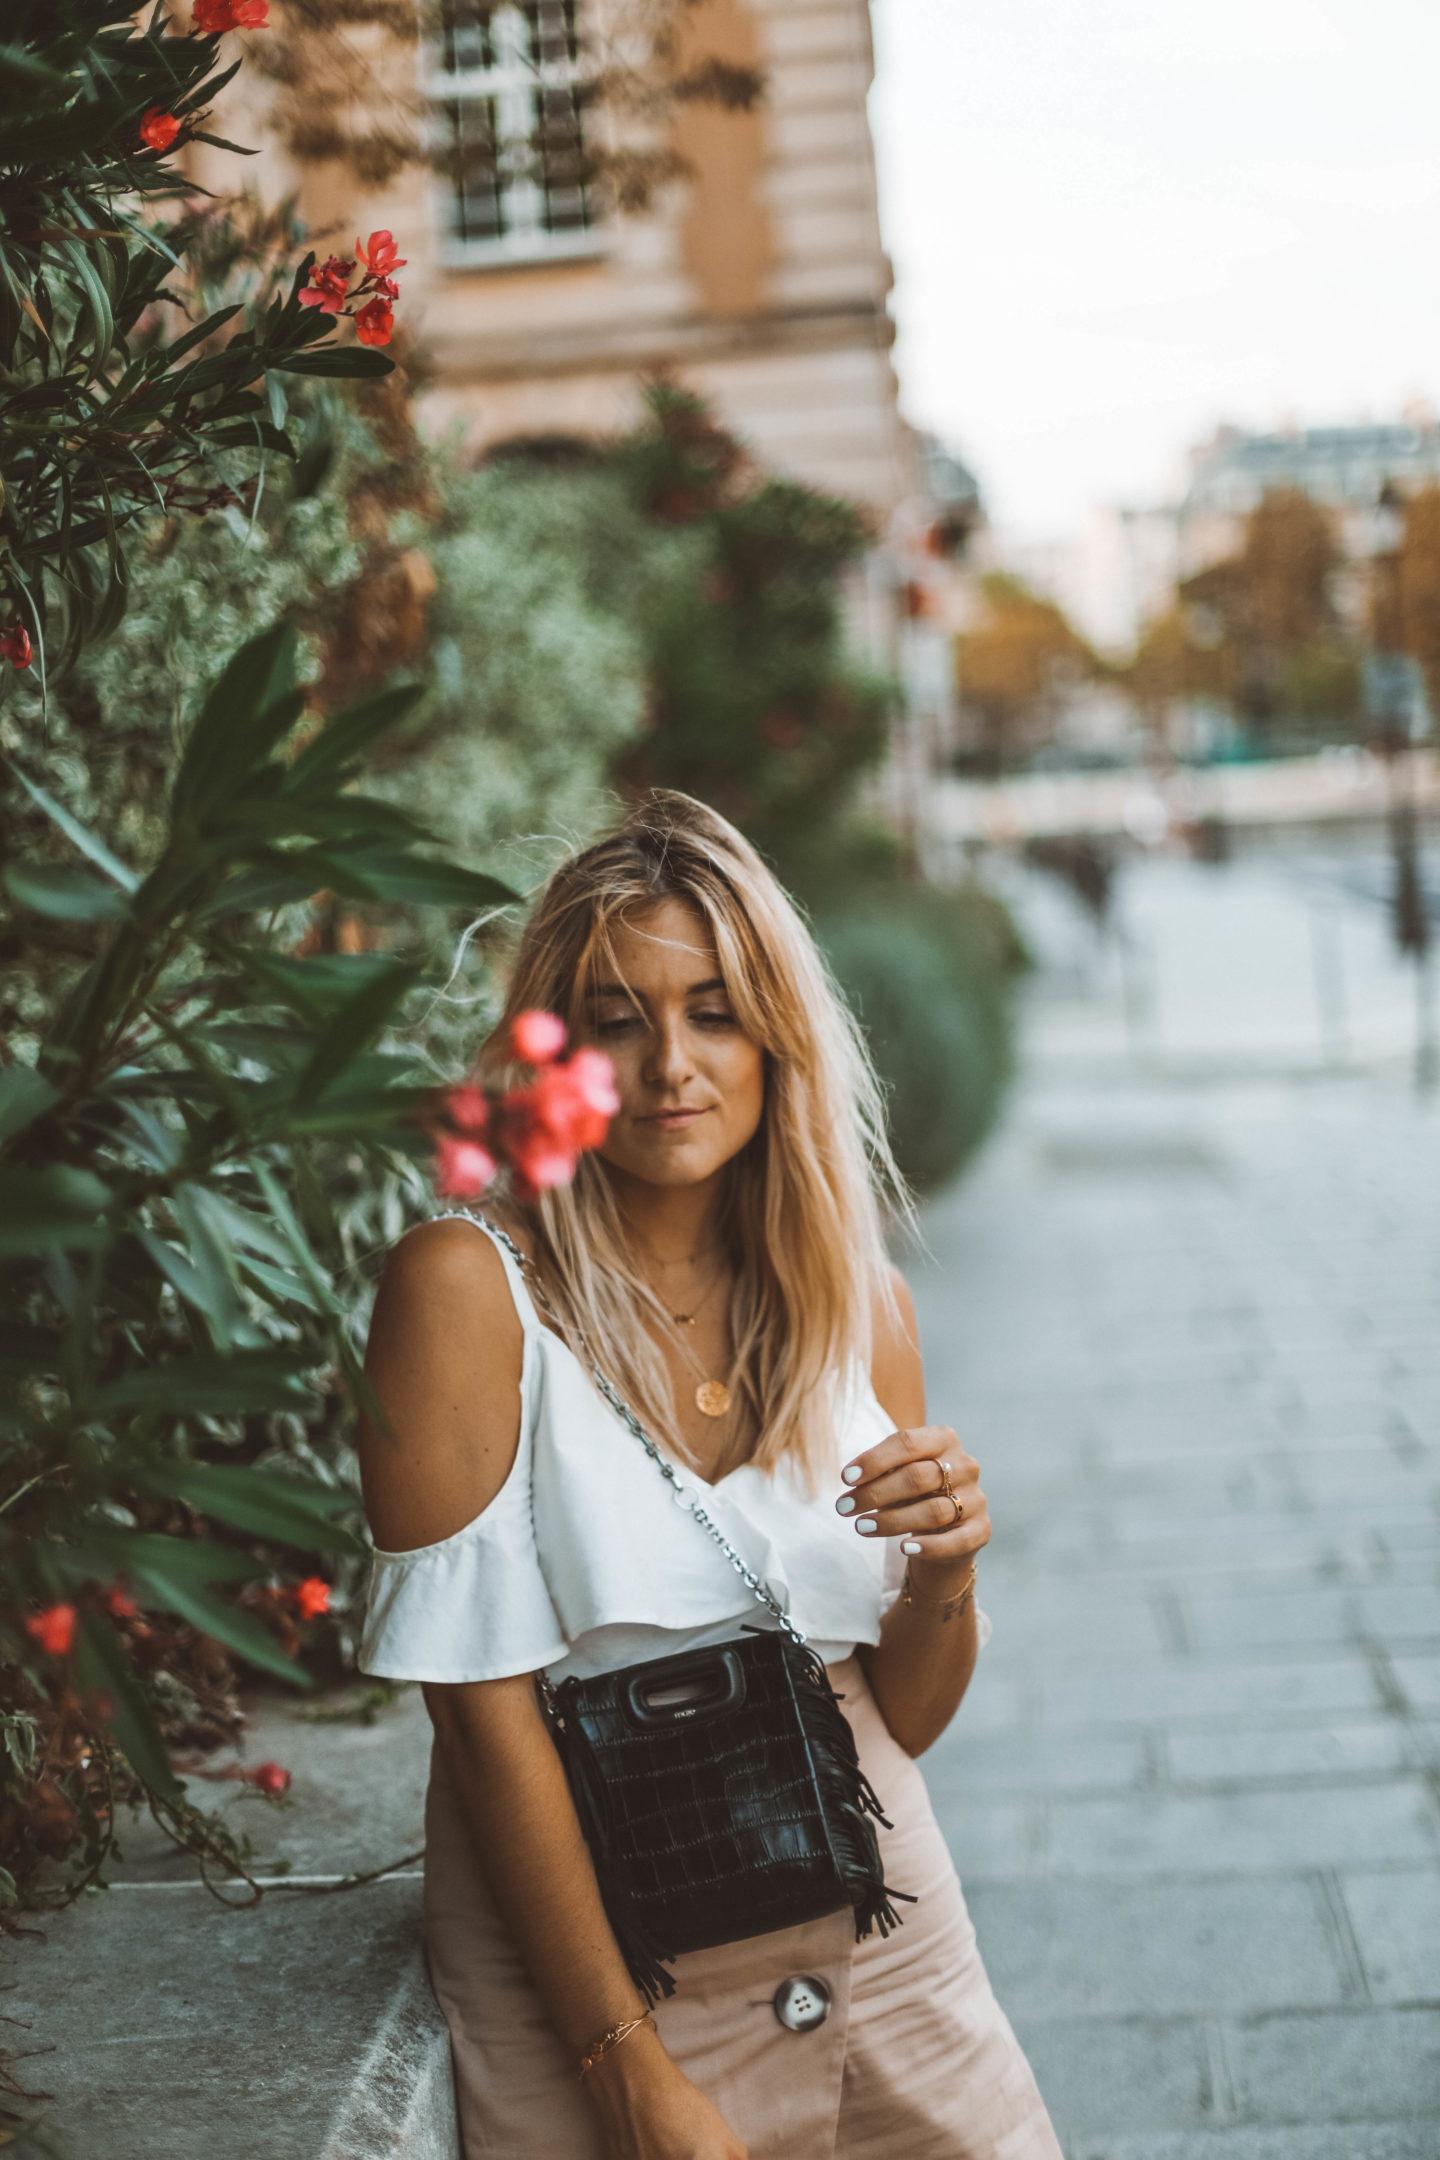 Collier Maje - Blondie baby blog mode Paris et voyages